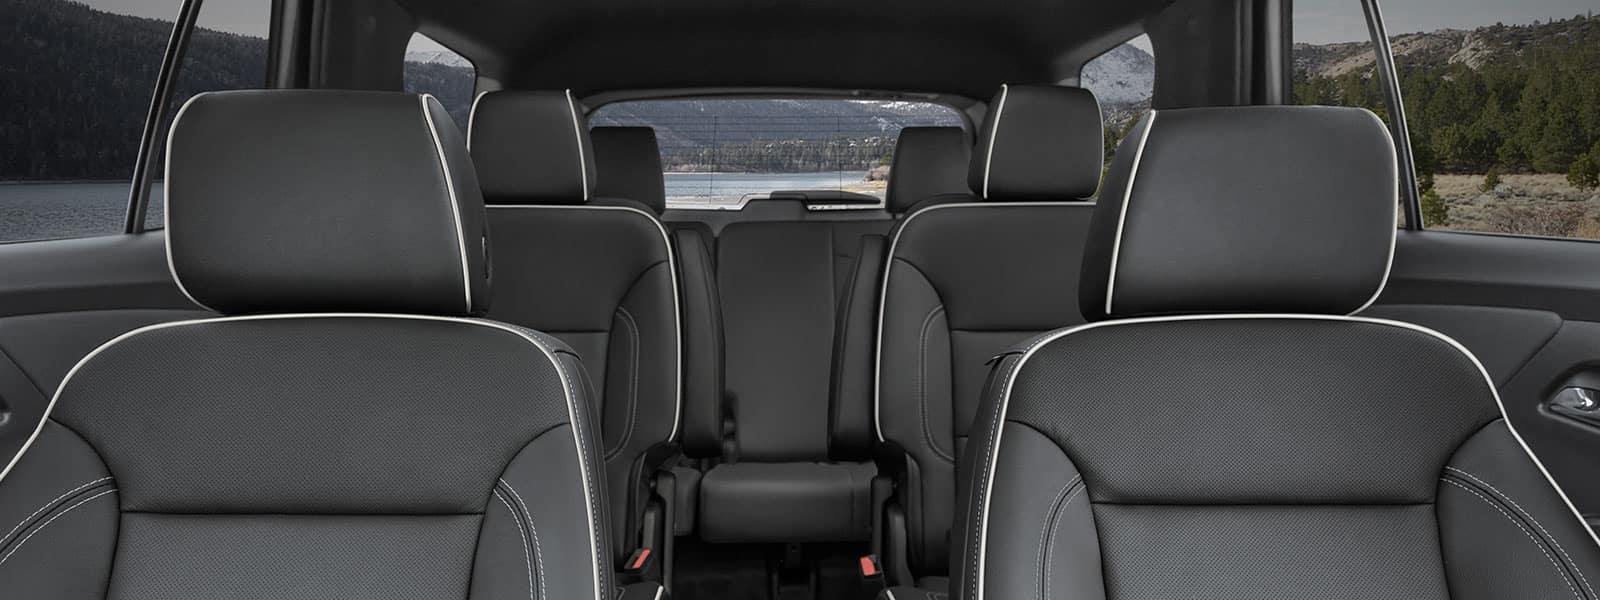 Lease or finance new 2022 Chevrolet Traverse in Weyburn SK